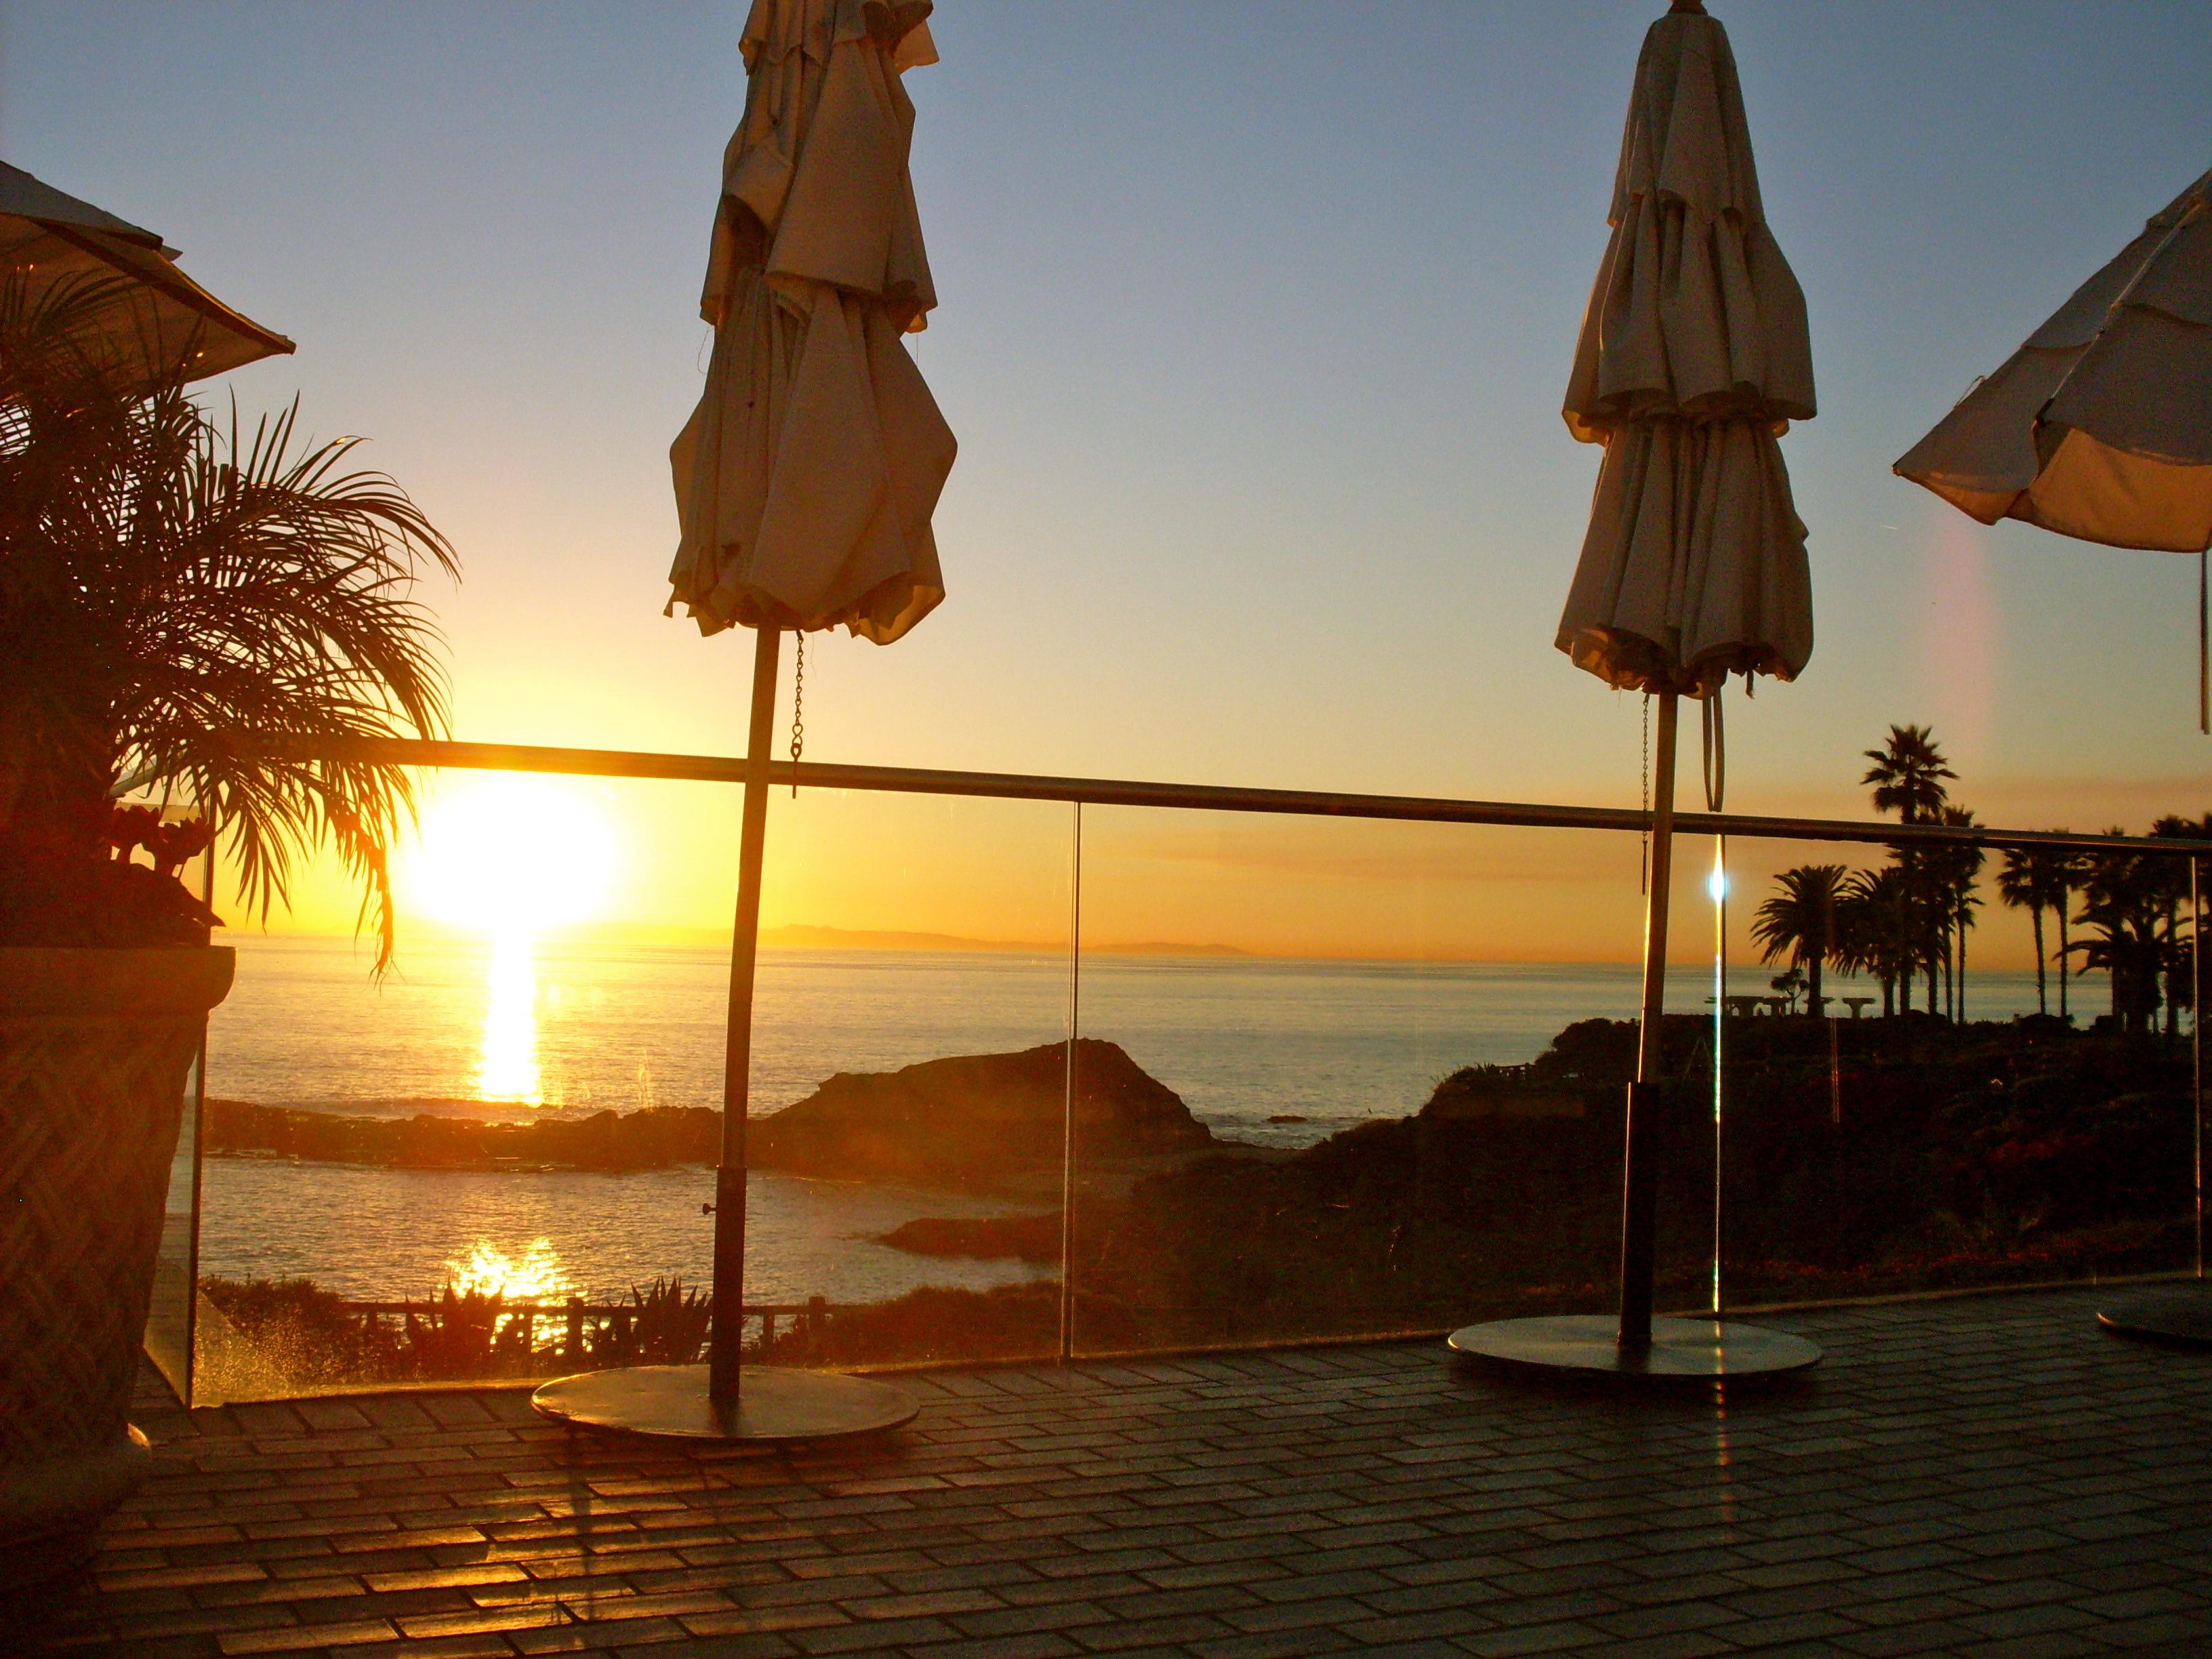 Sunset at the Montage Laguna Beach